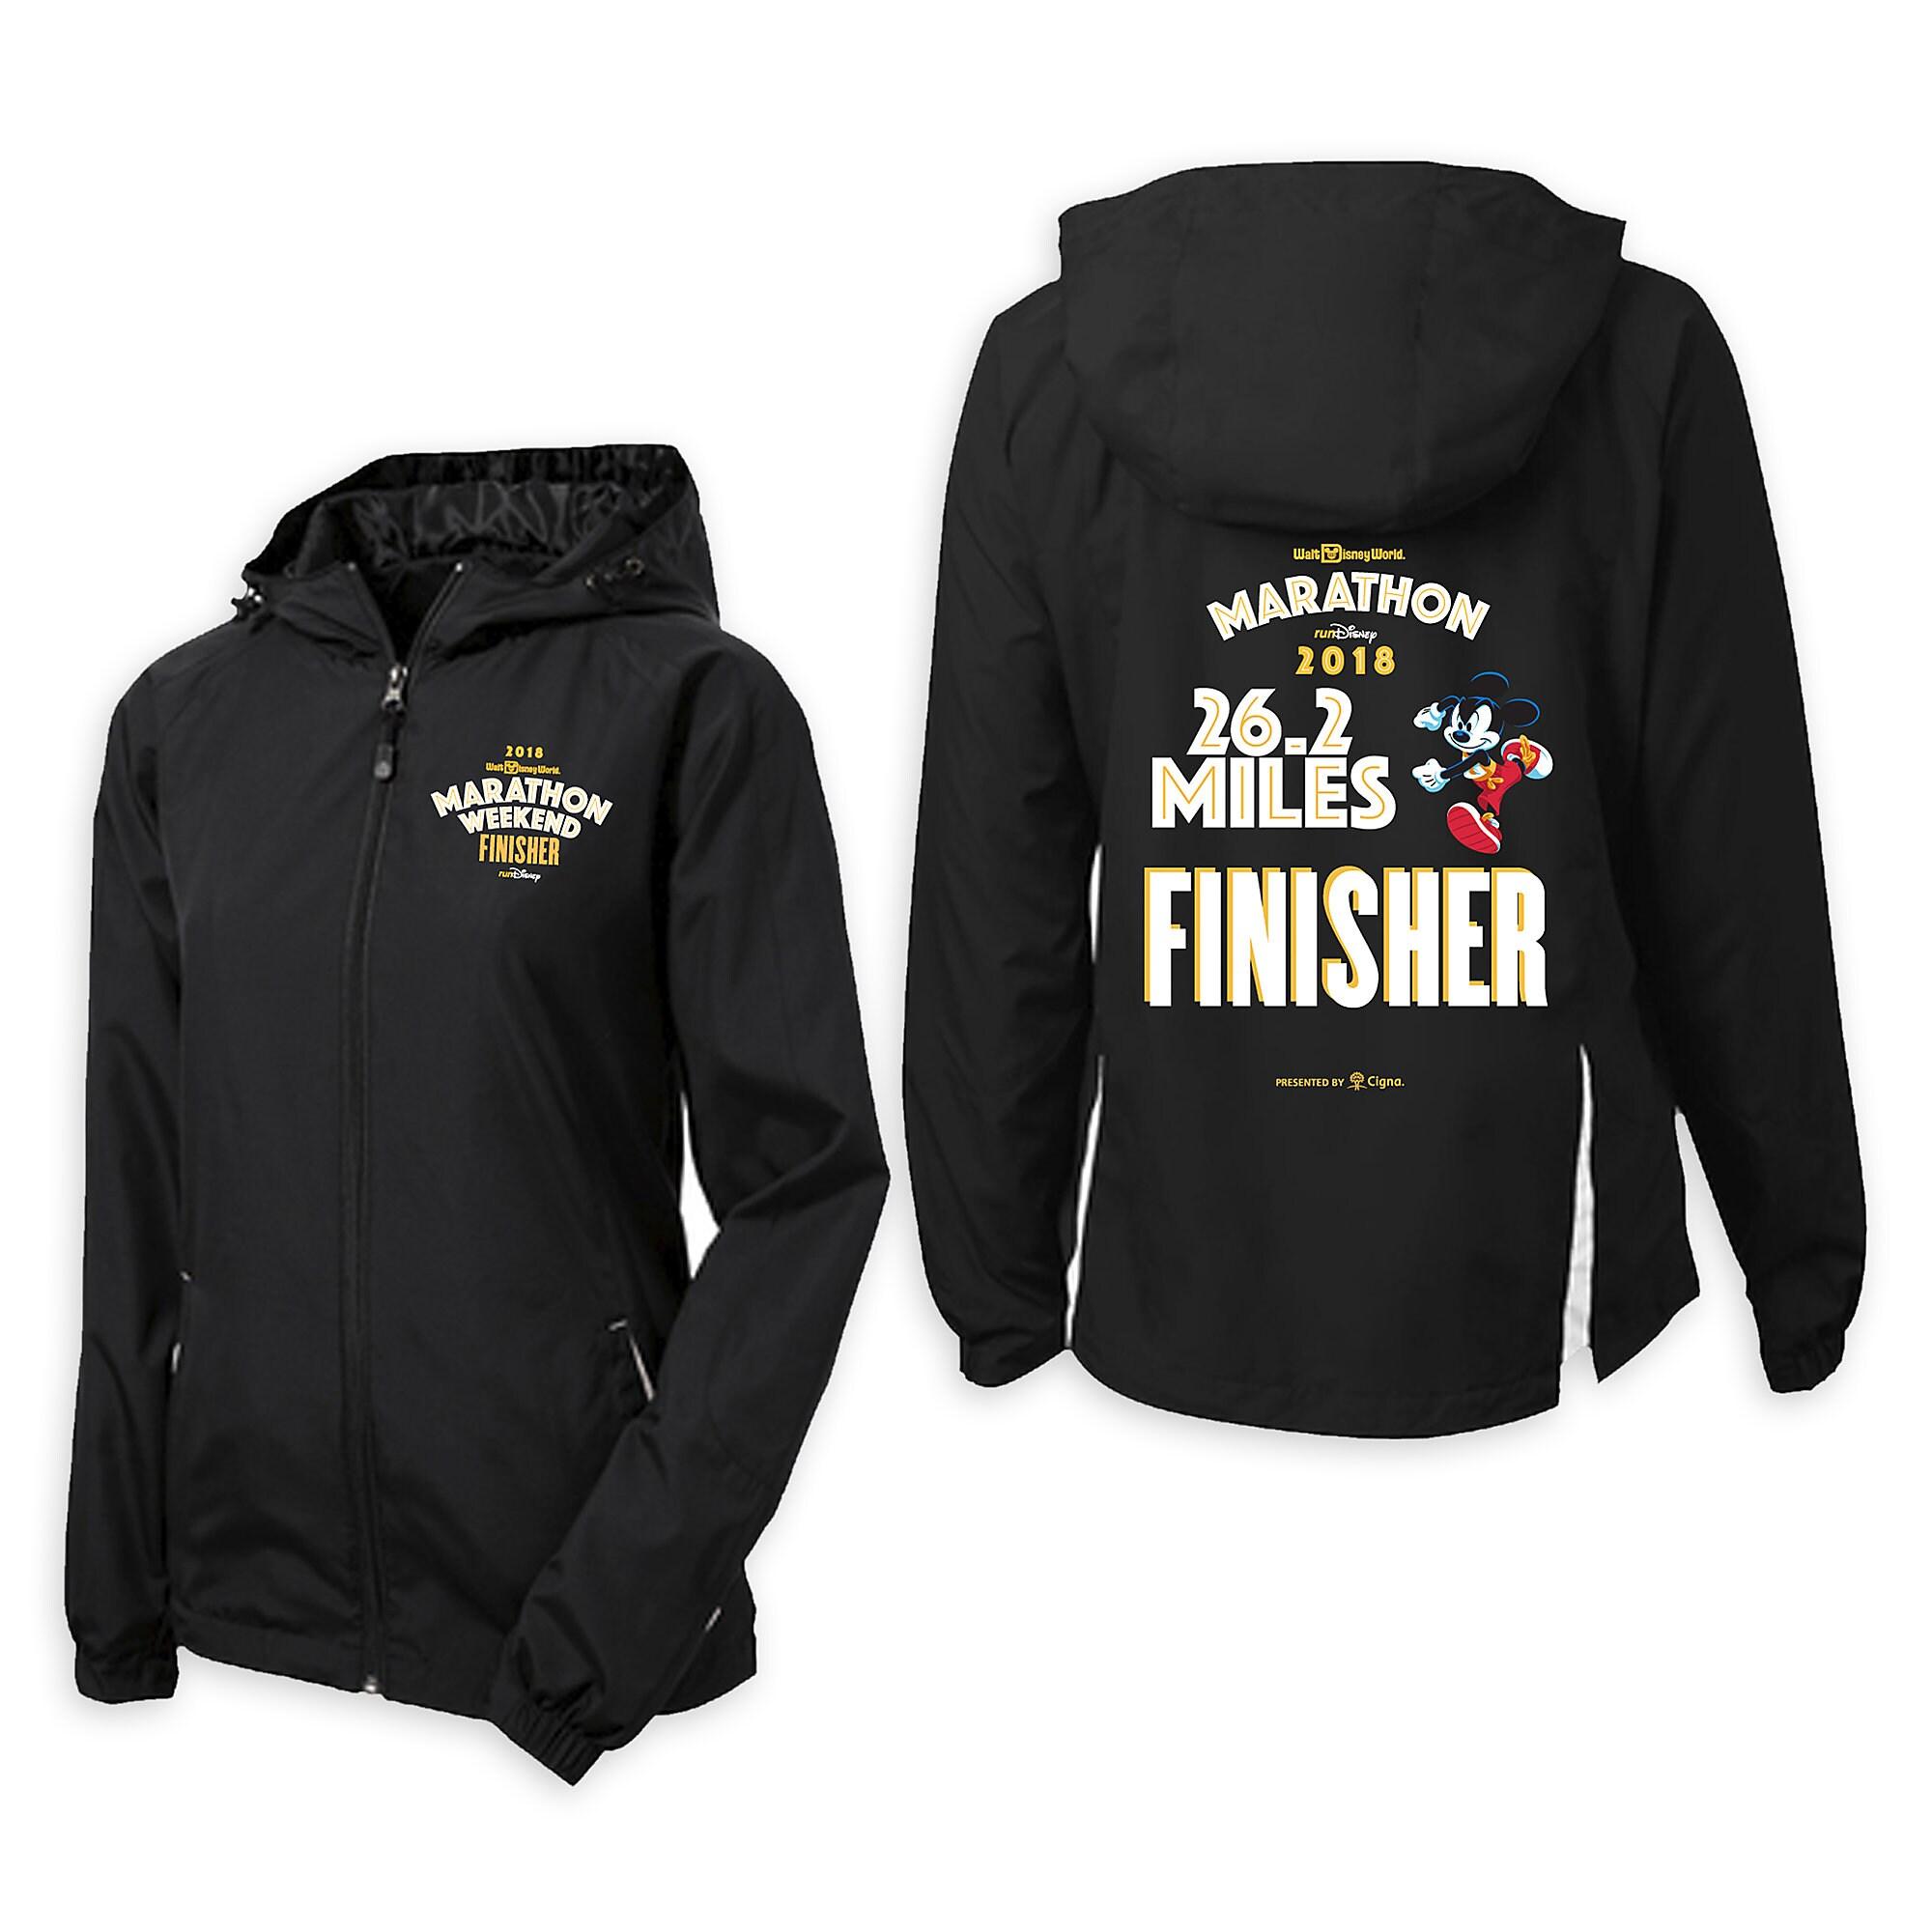 Mickey Mouse runDisney Walt Disney World Marathon Finisher Jacket for Women - Limited Release